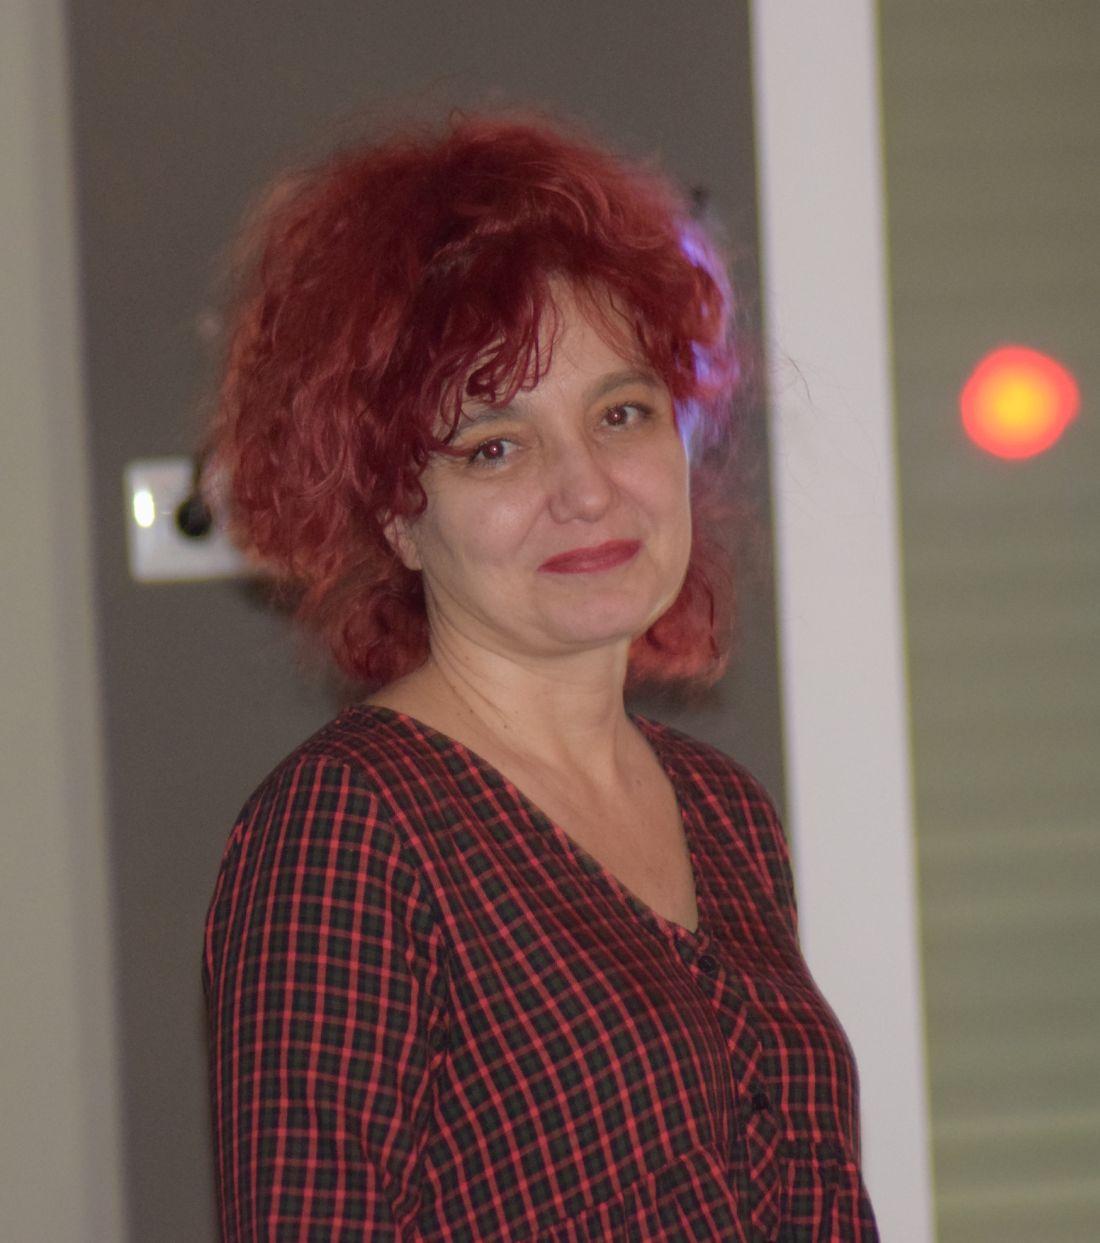 DSC_0100.1100 - Mihaela Tertelici - Prof., Director executiv Lucky Kyds Roman 2019 (foto Bogdan Dragomir)